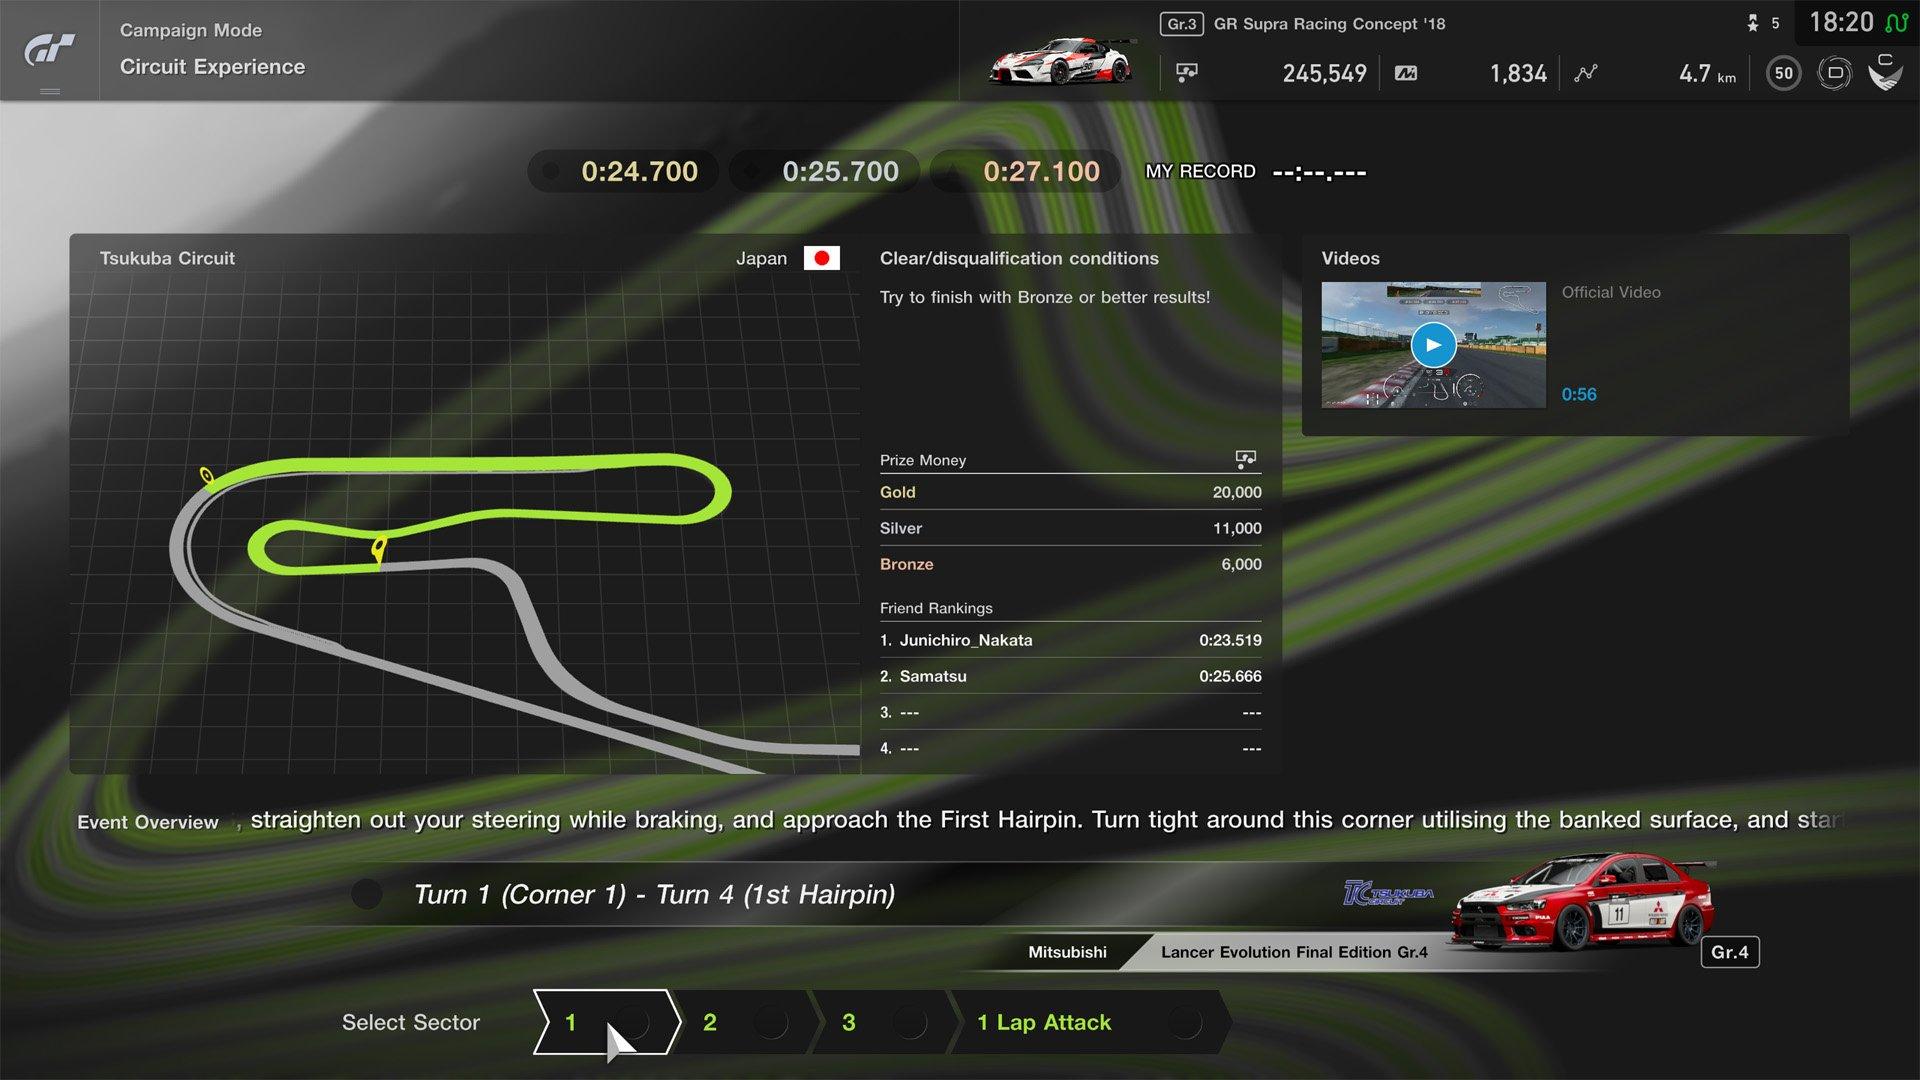 Gran Turismo Sport April update Tsukuba Circuit circuit experience